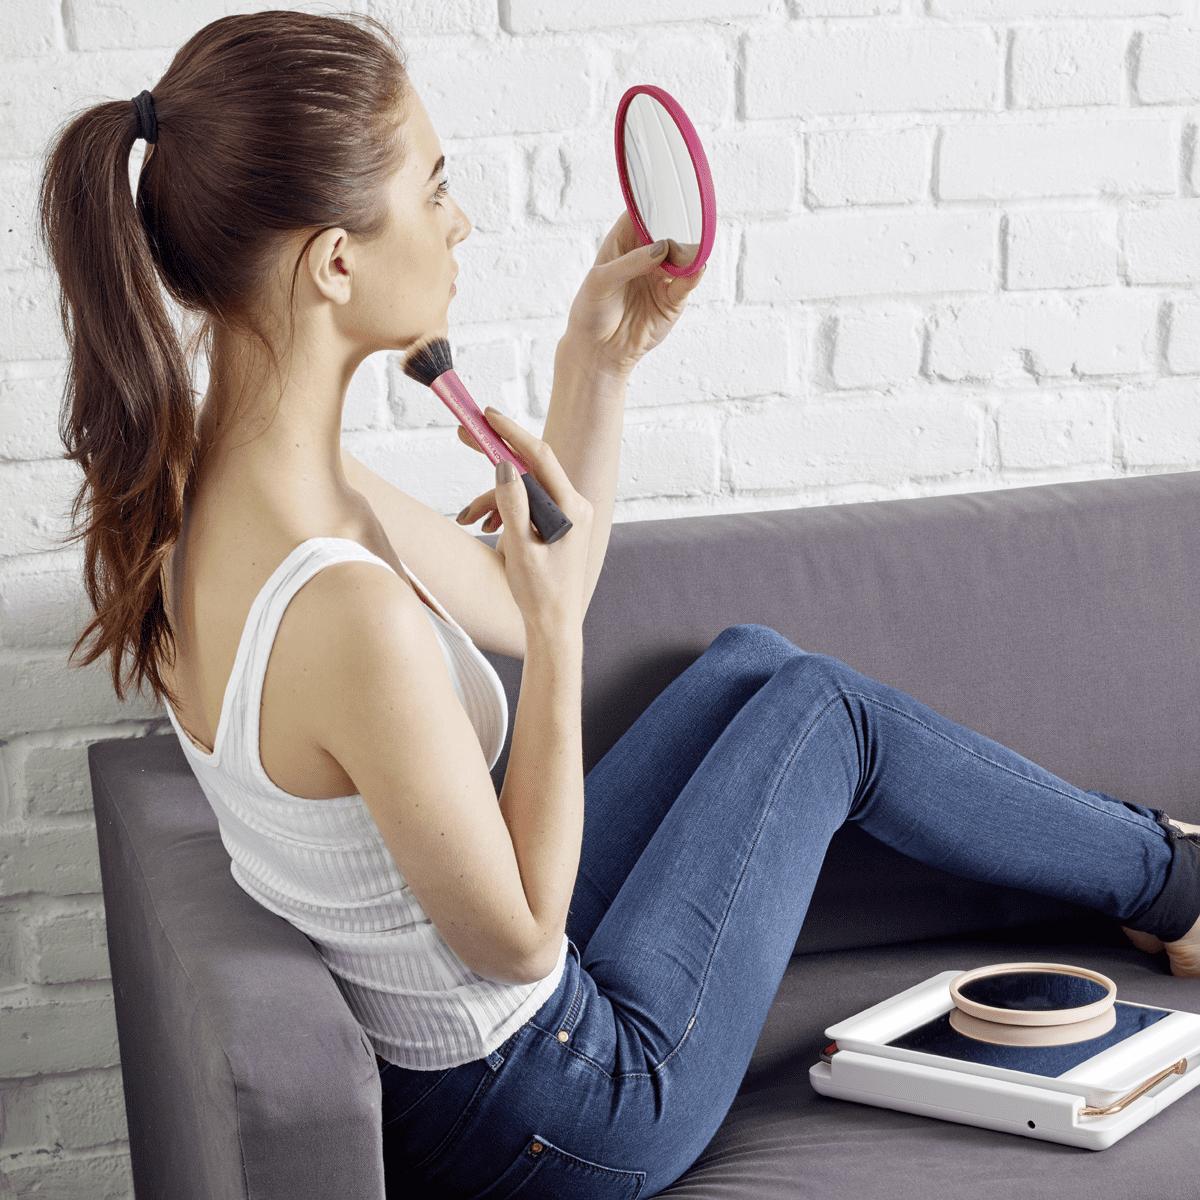 Joi Spotlite Hd Professional Makeup Mirror For Perfect Makeup